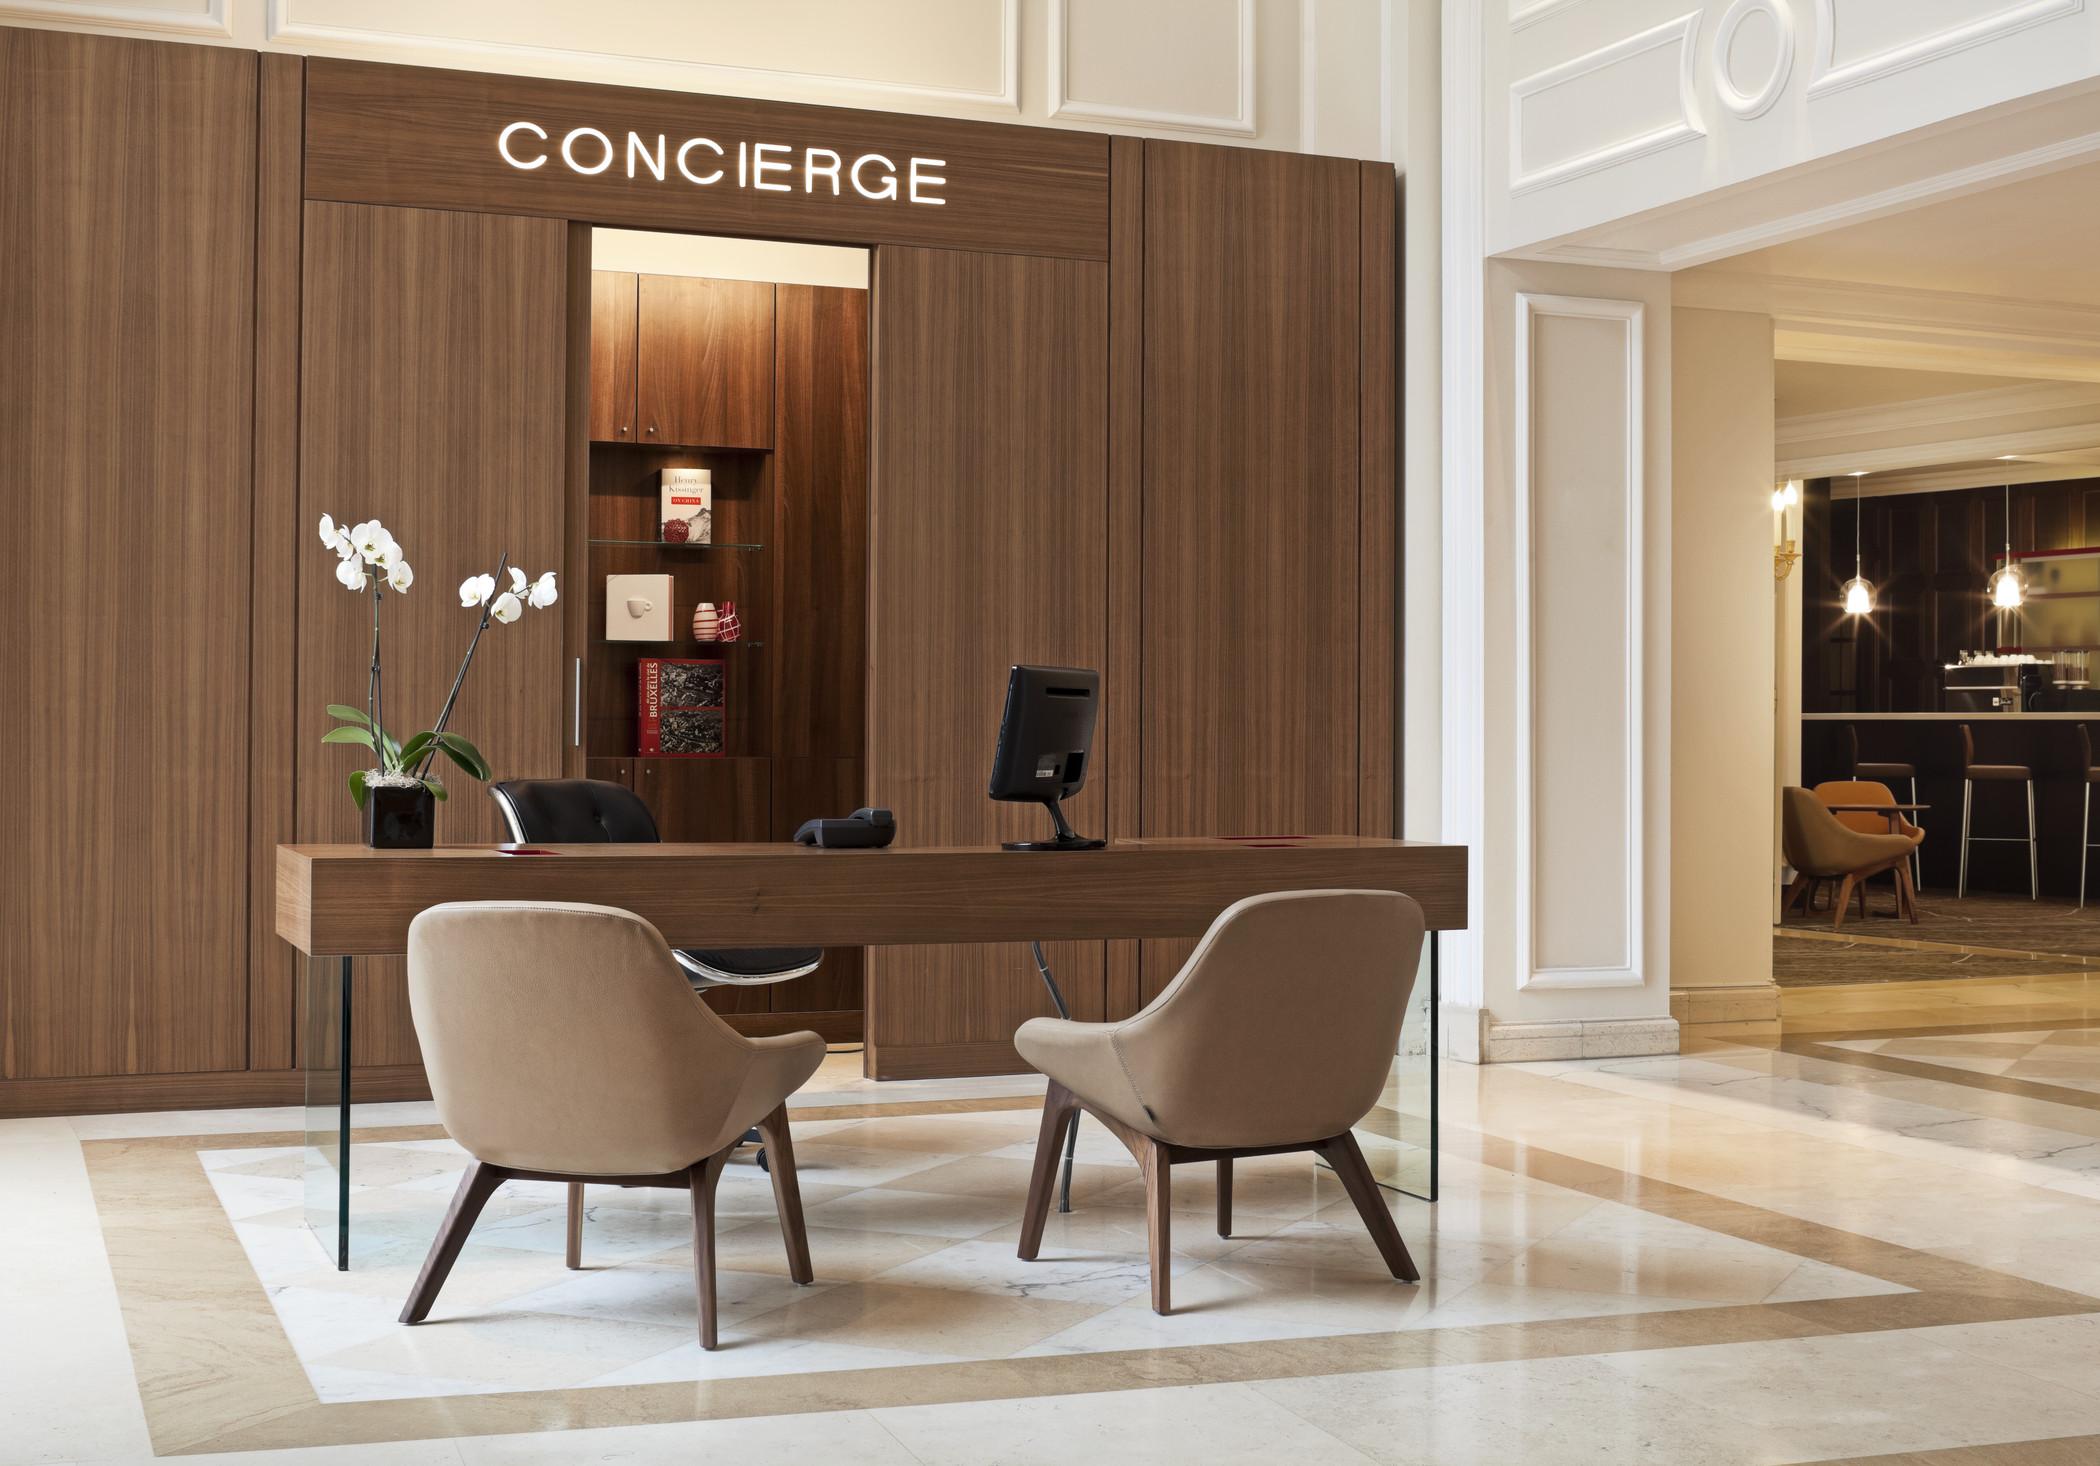 Binary options concierge